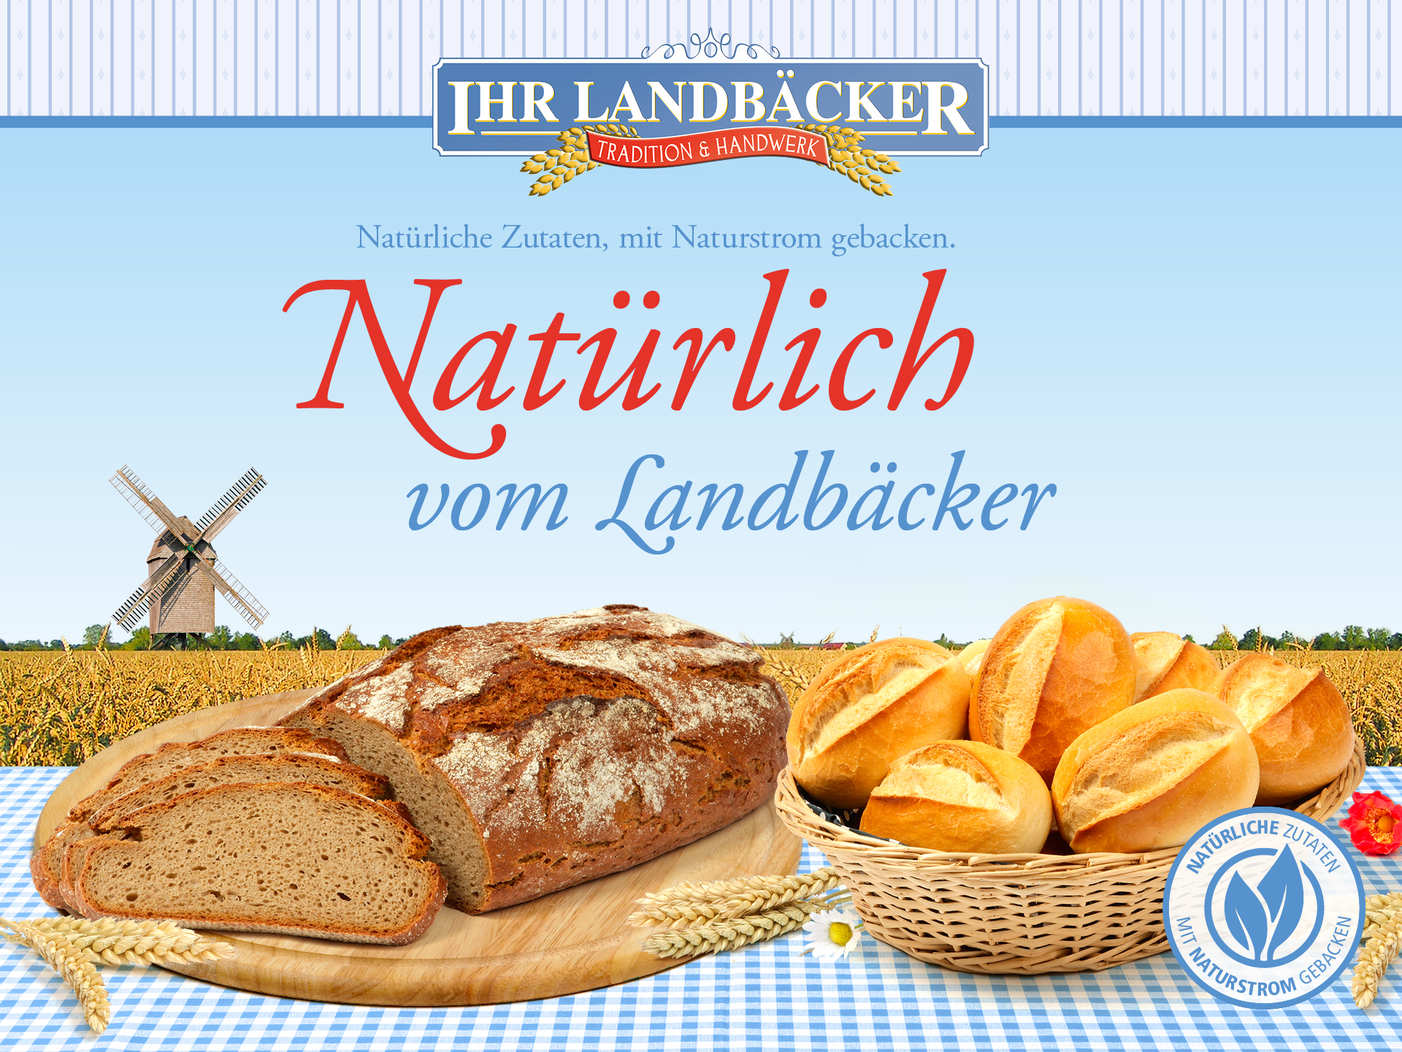 ILB-13-0003_Kampagne_Natuerlichkeit_WebRef_1920x1440